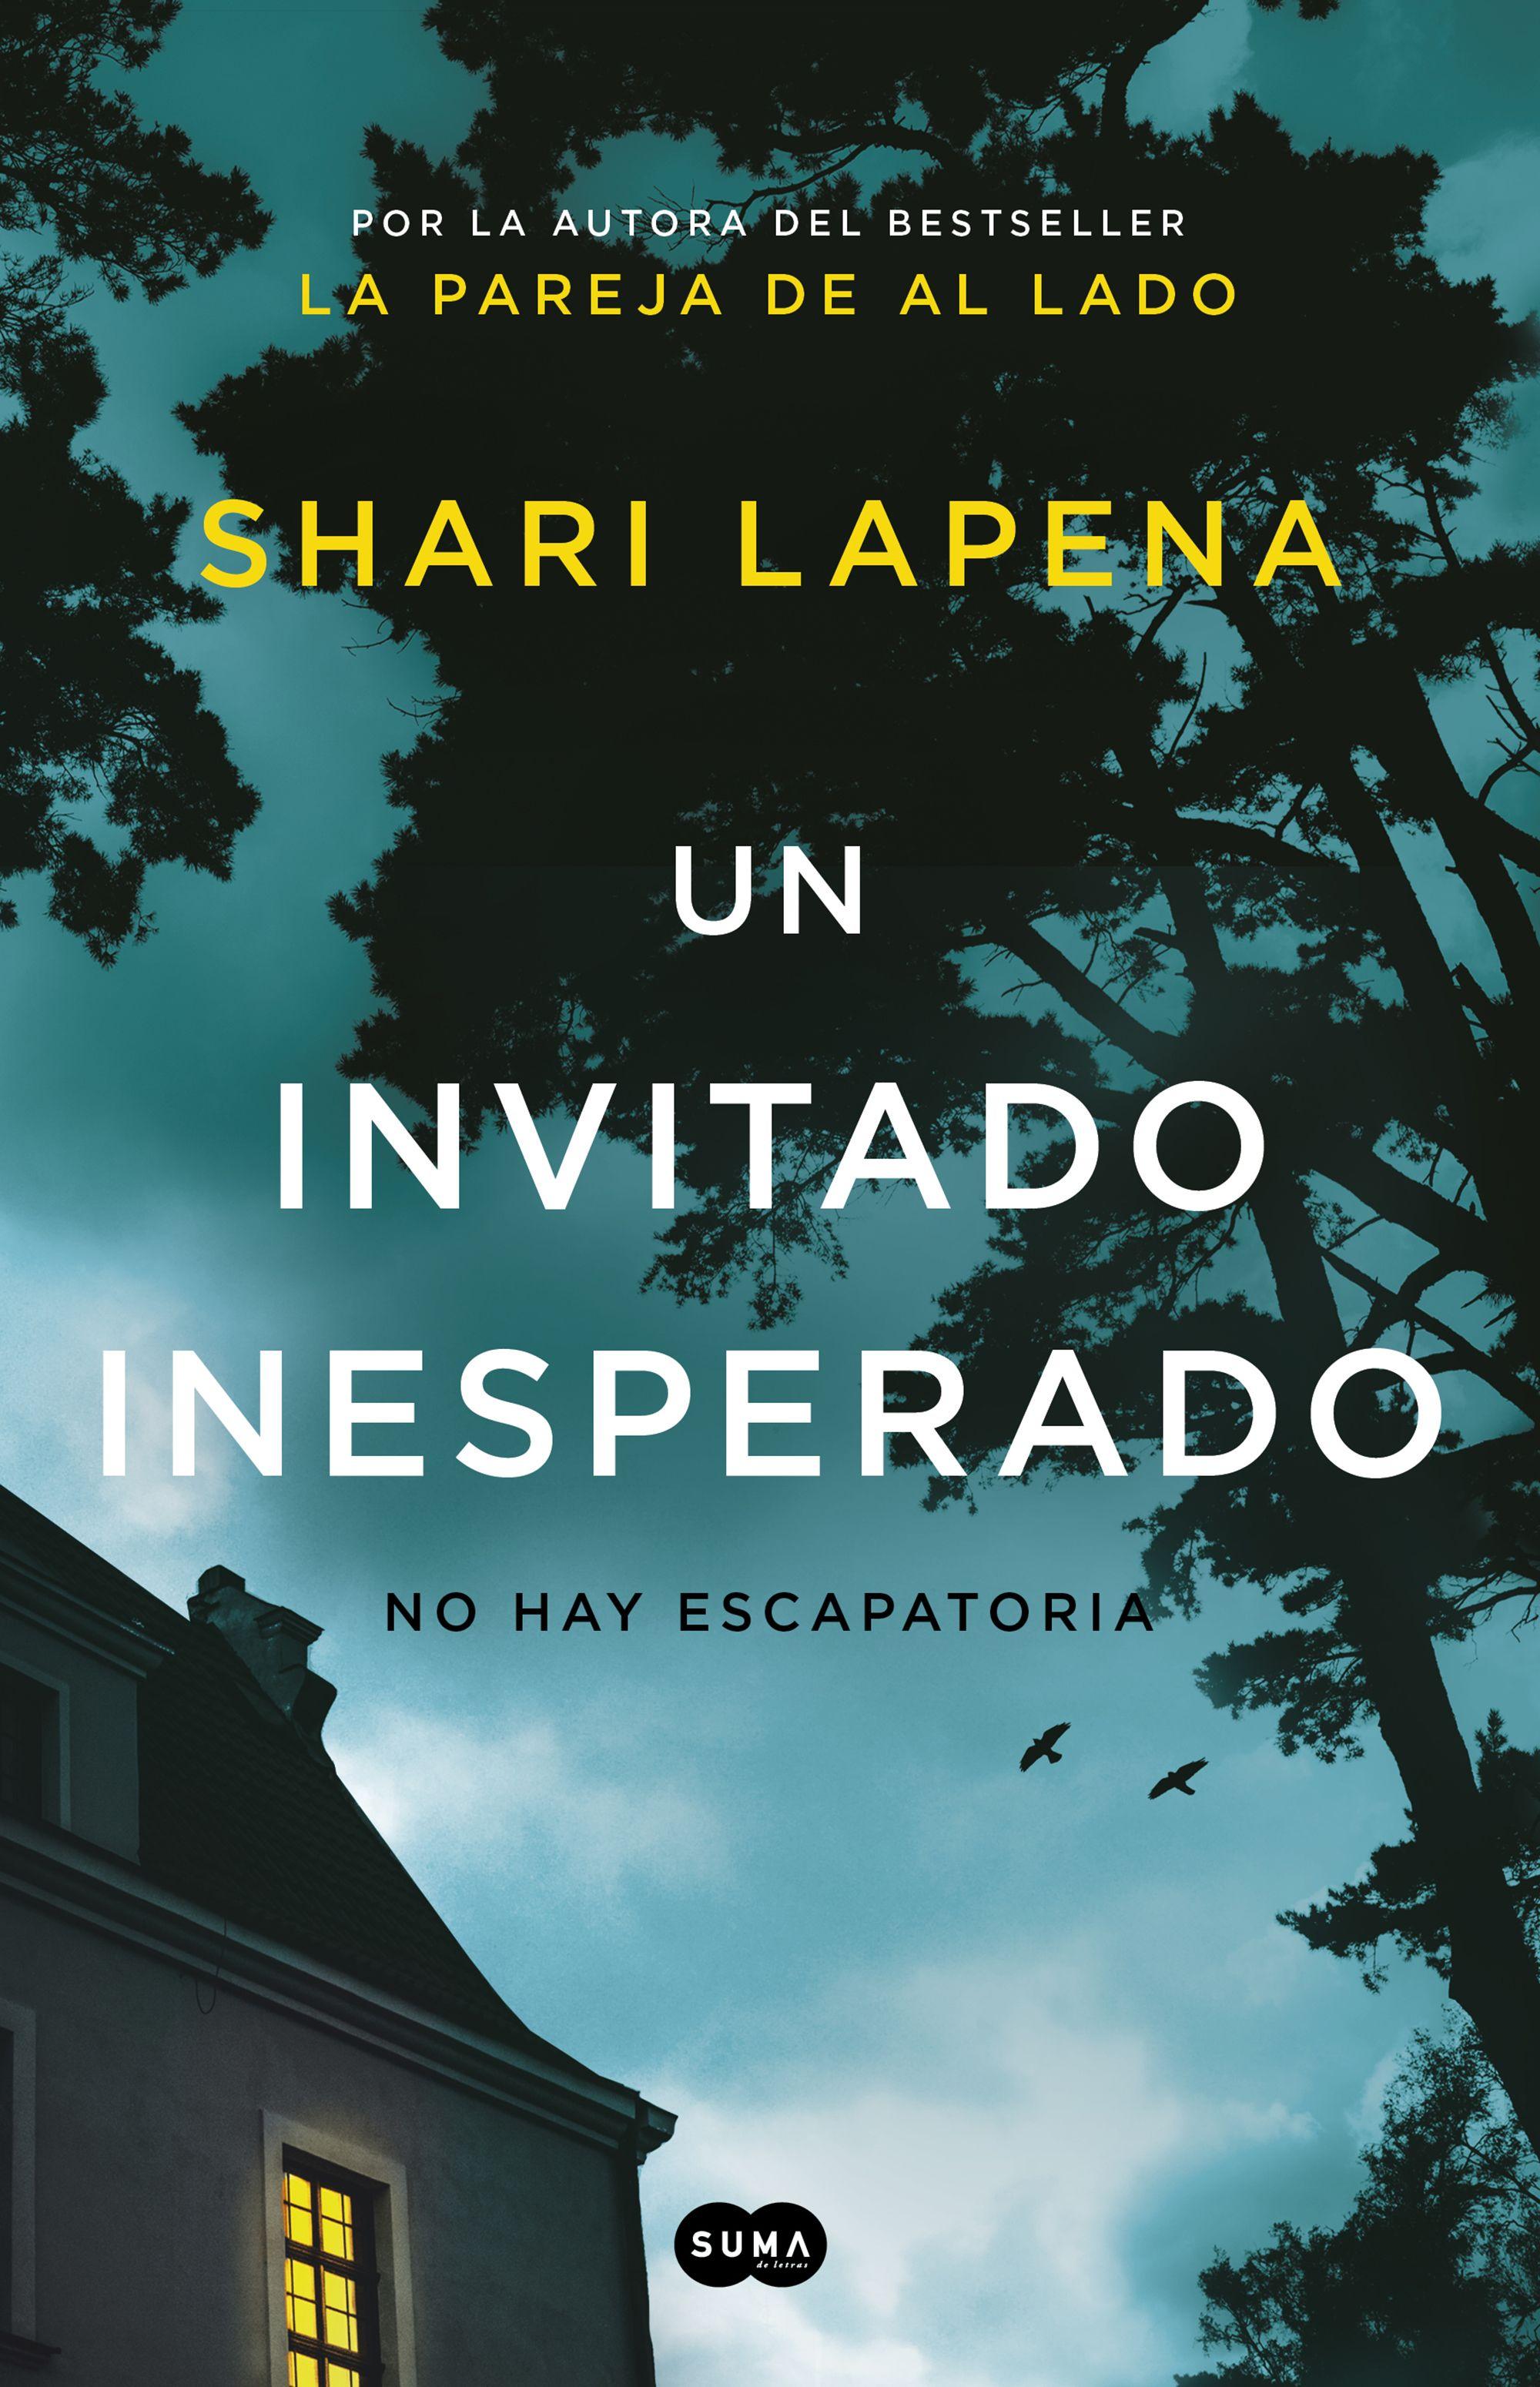 Libros De Suspenso, Libros Suspenso,  Libros De Misterio @tataya.com.mx